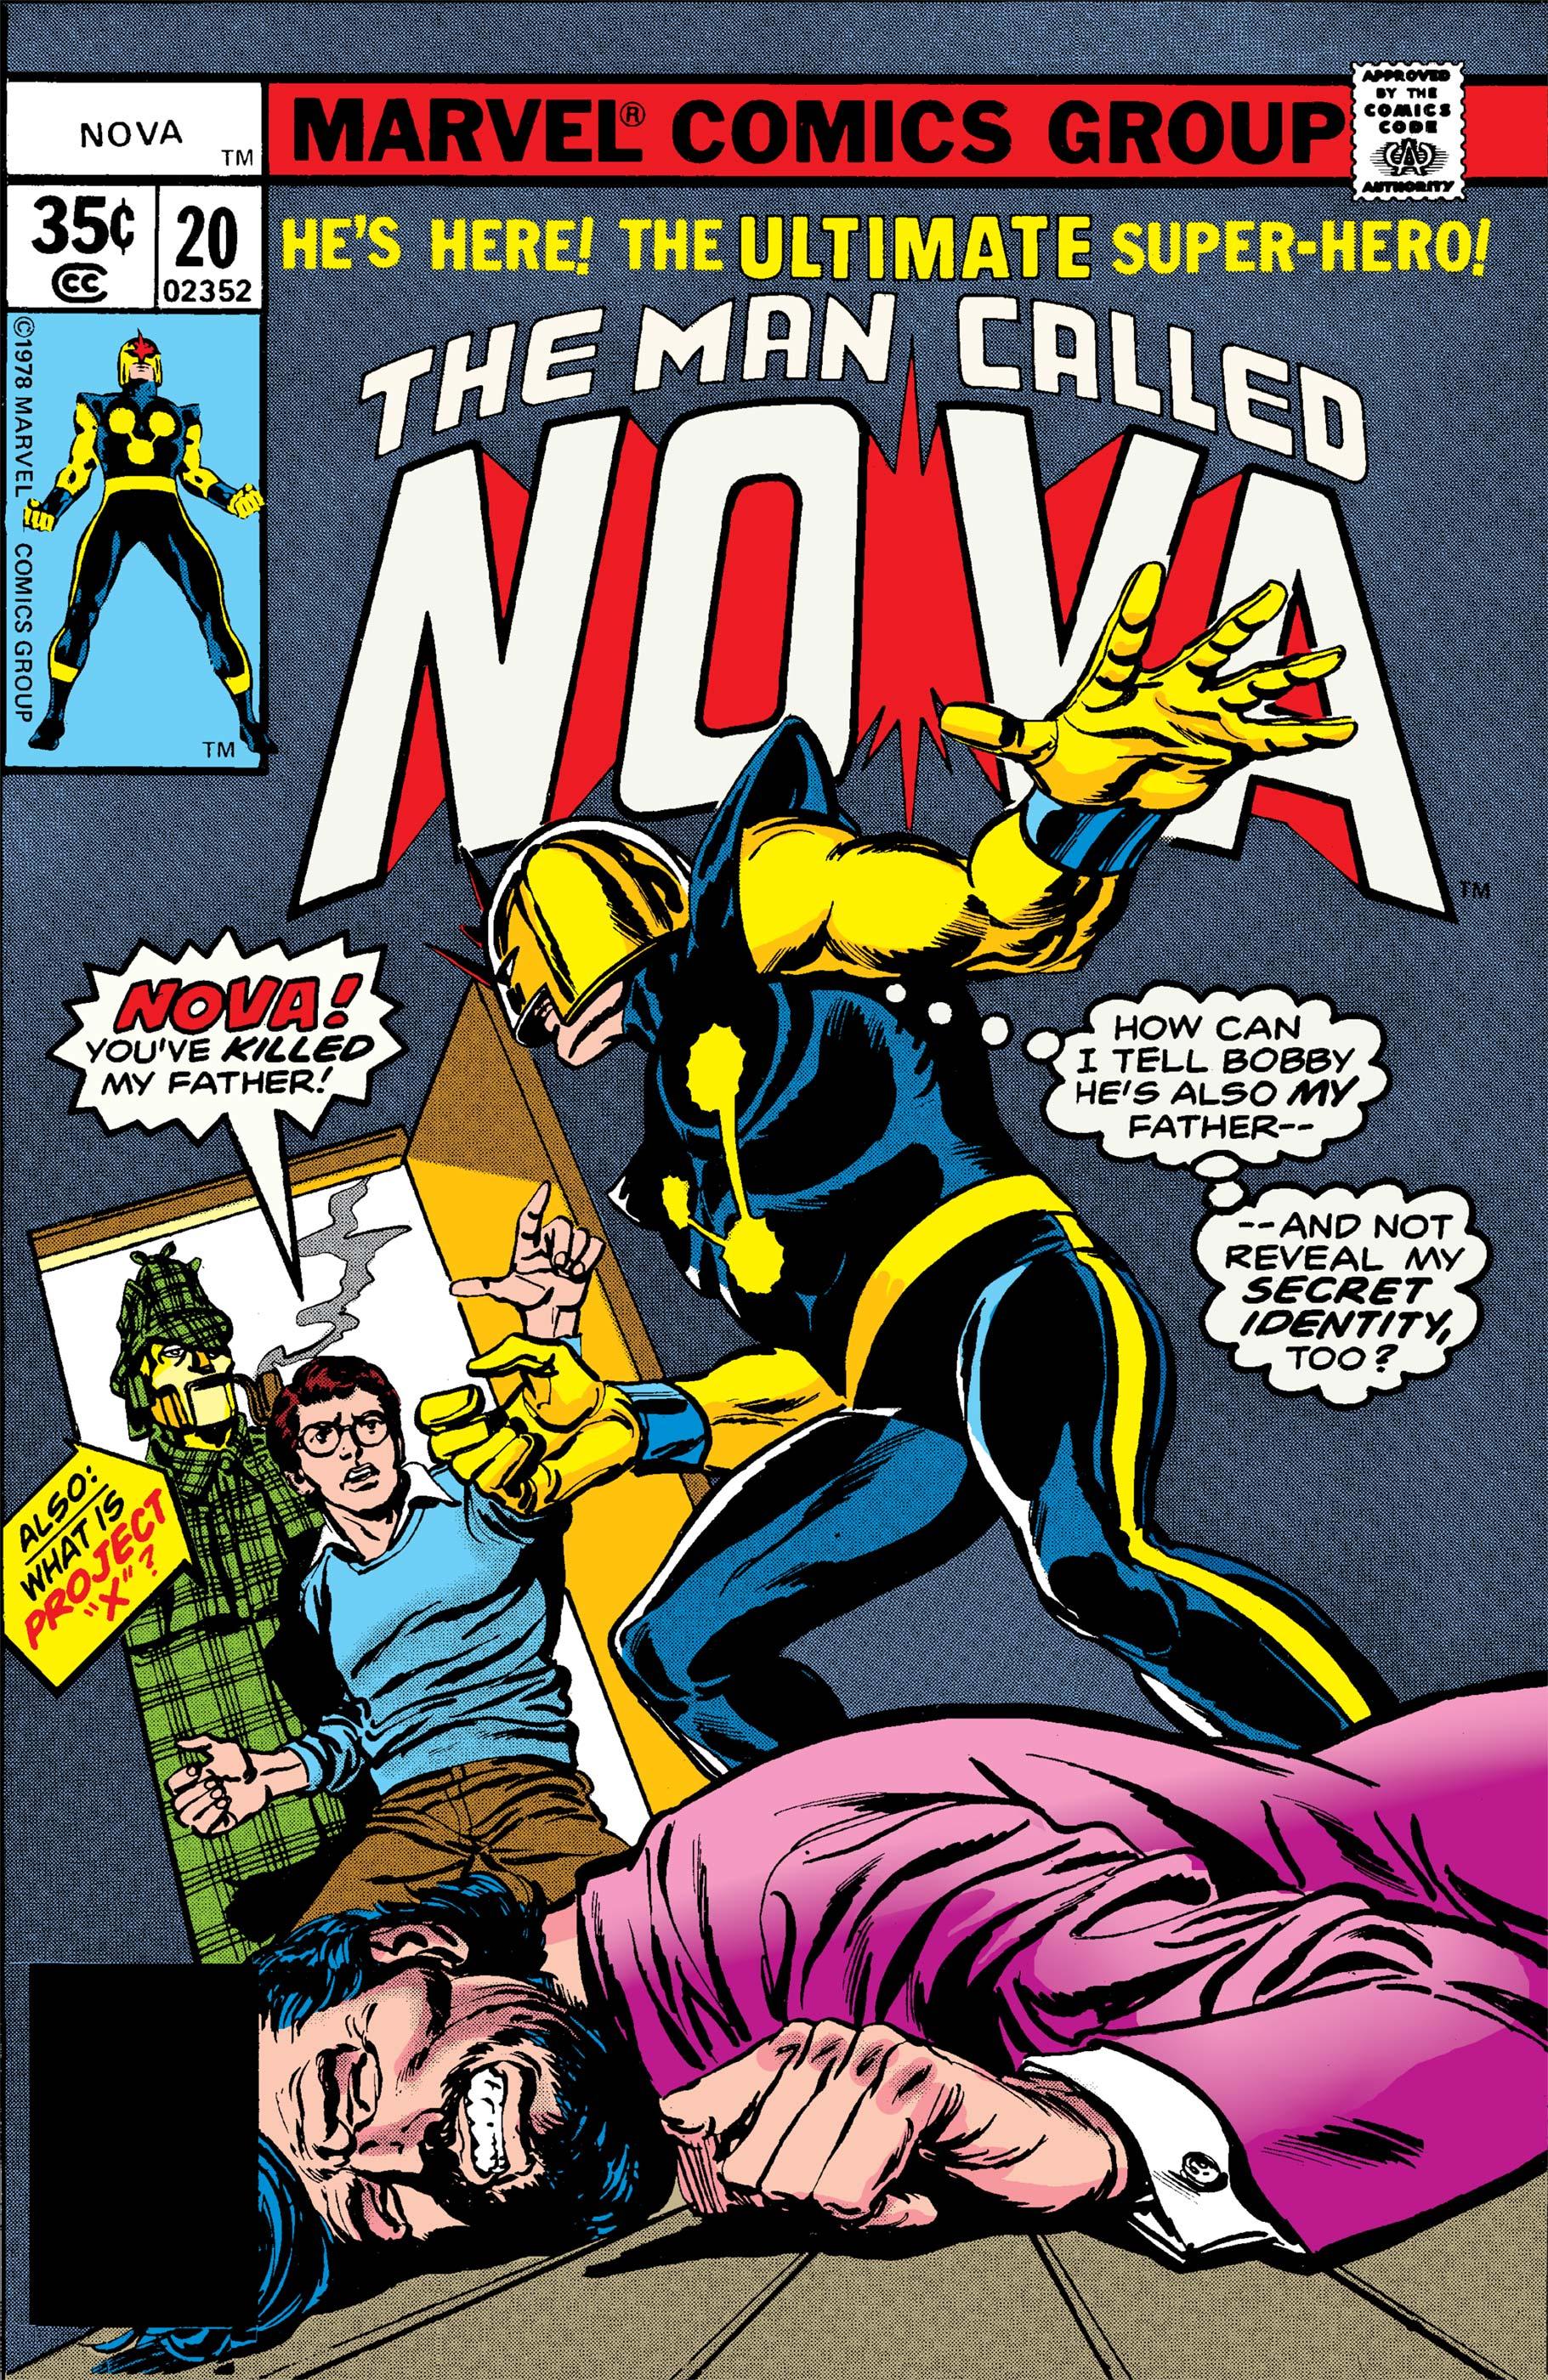 Nova (1976) #20